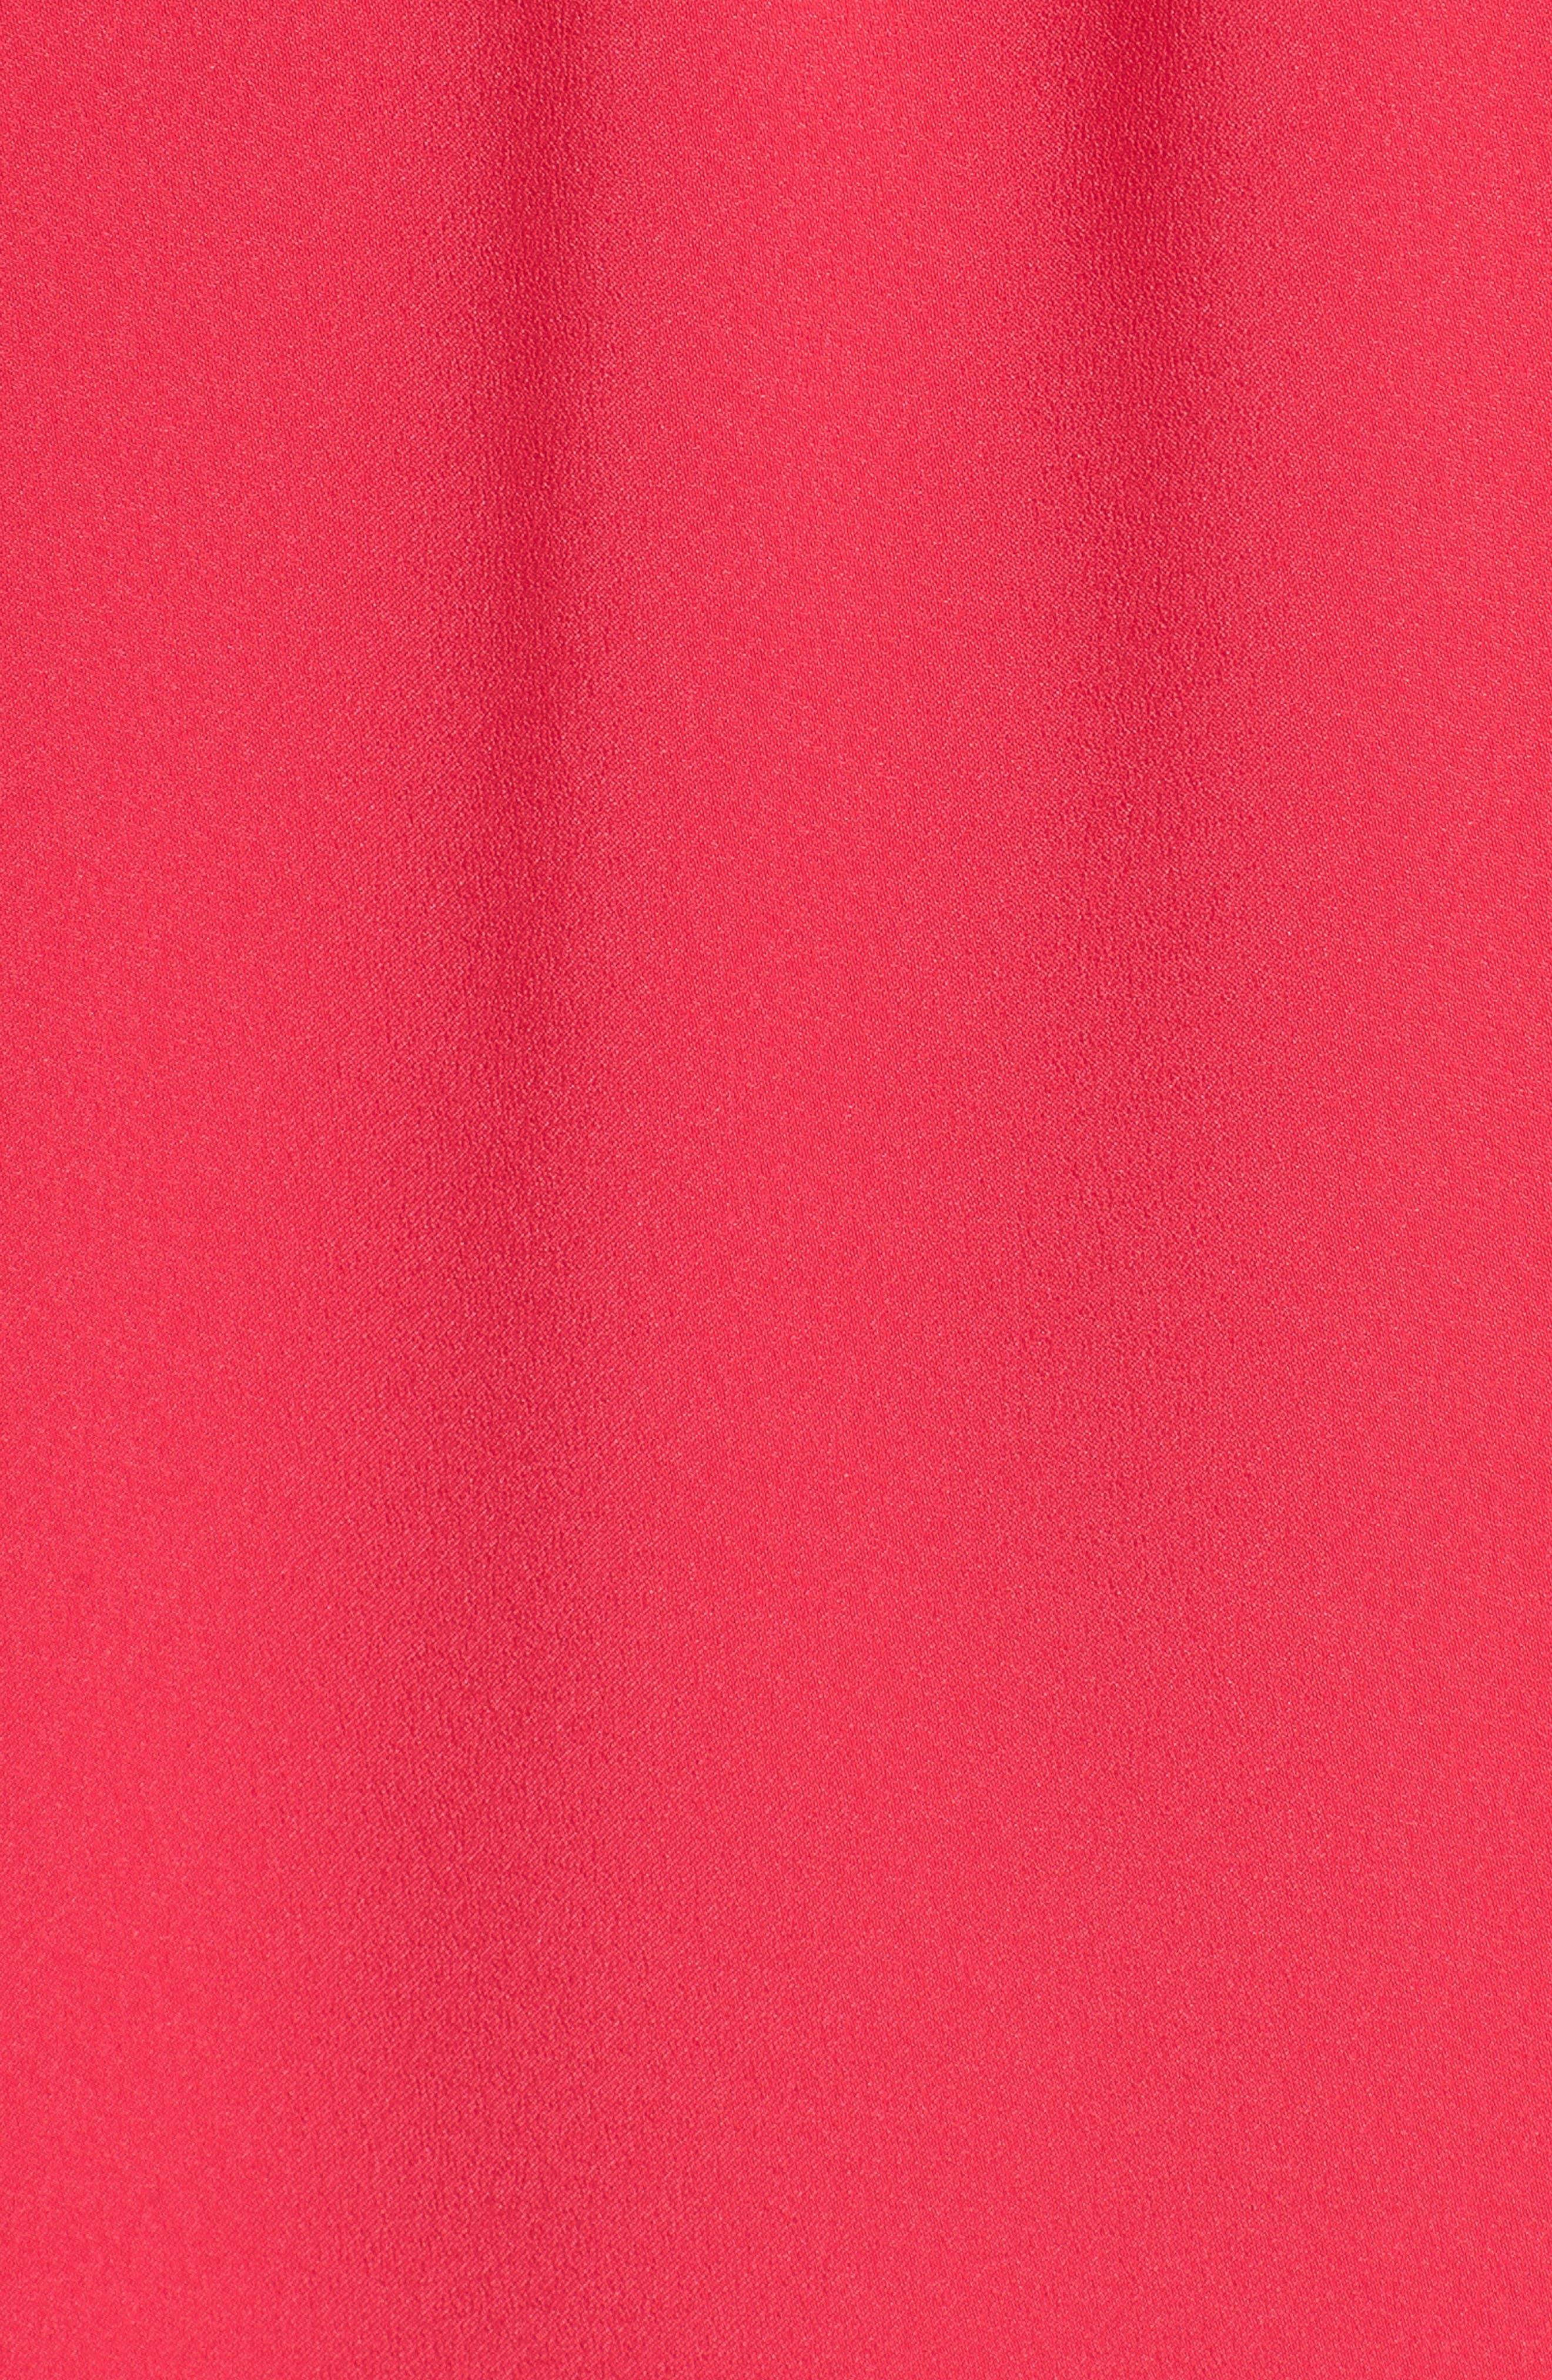 Off the Shoulder Crepe Dress,                             Alternate thumbnail 24, color,